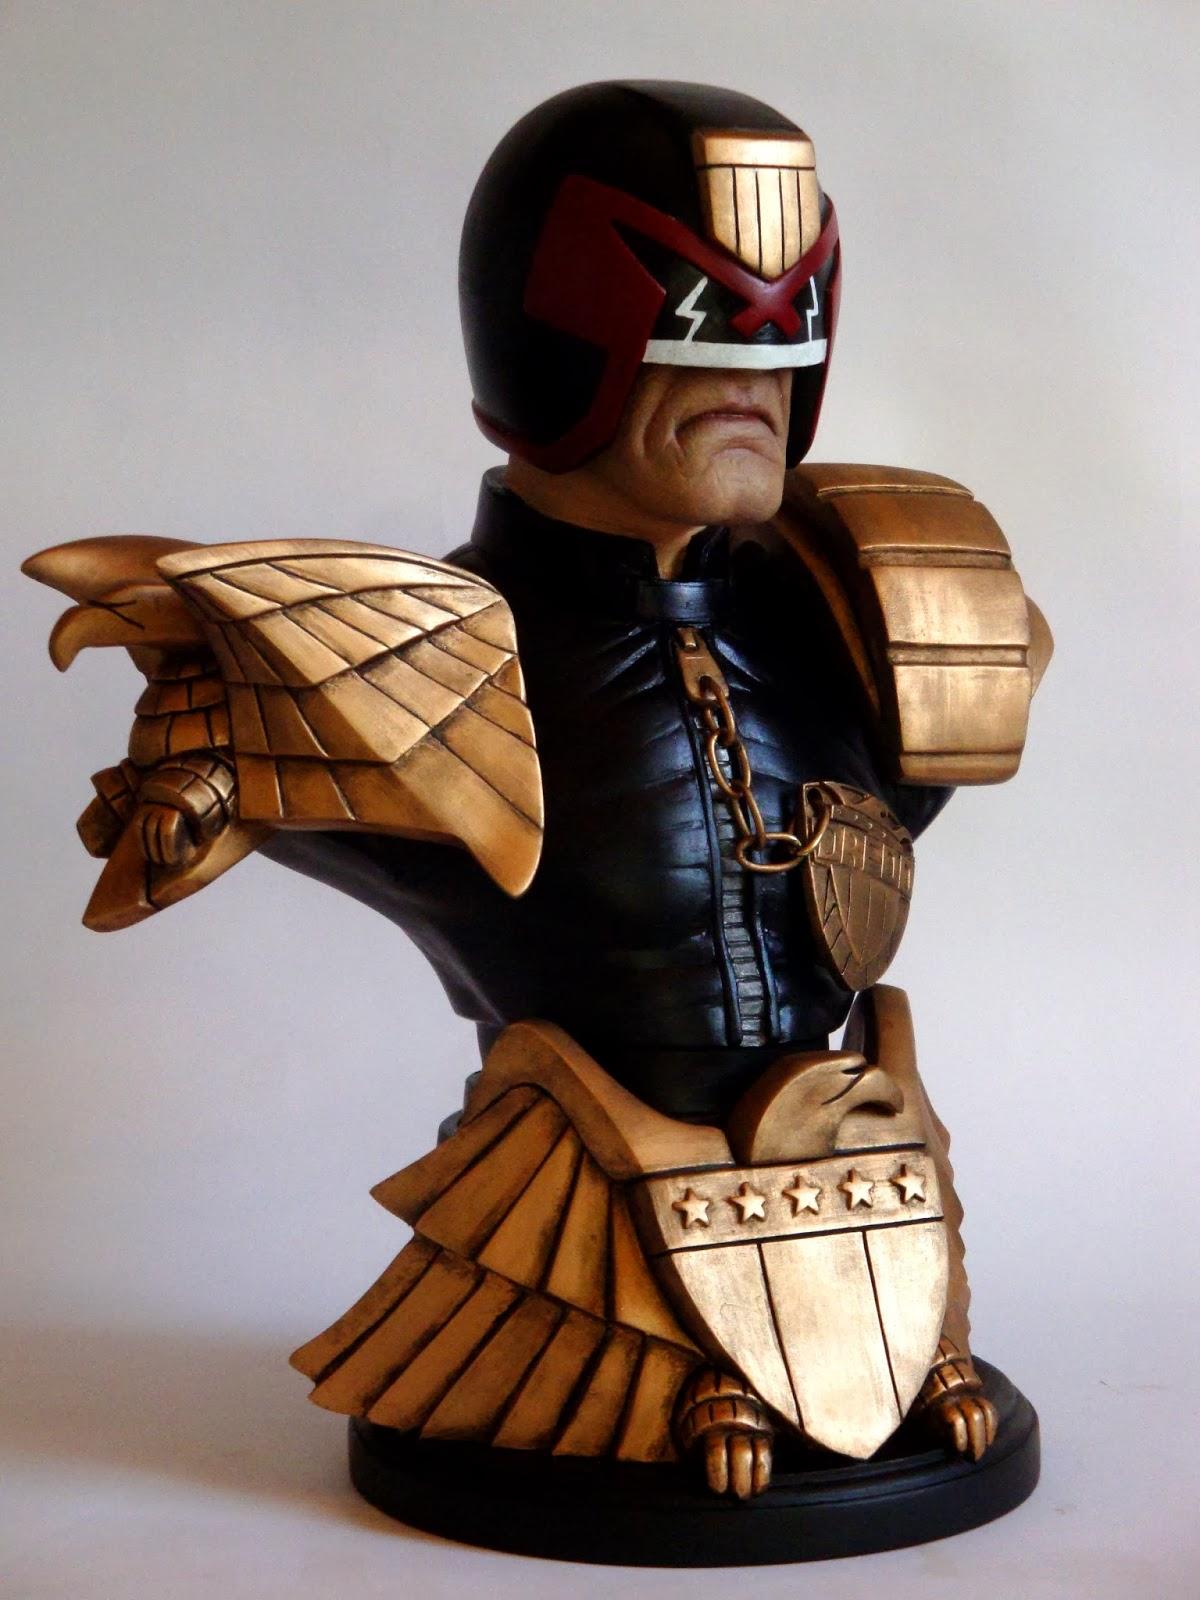 Michael White Sculpting Amp Props Judge Dredd Amp Judge Anderson 1 3 Scale Busts